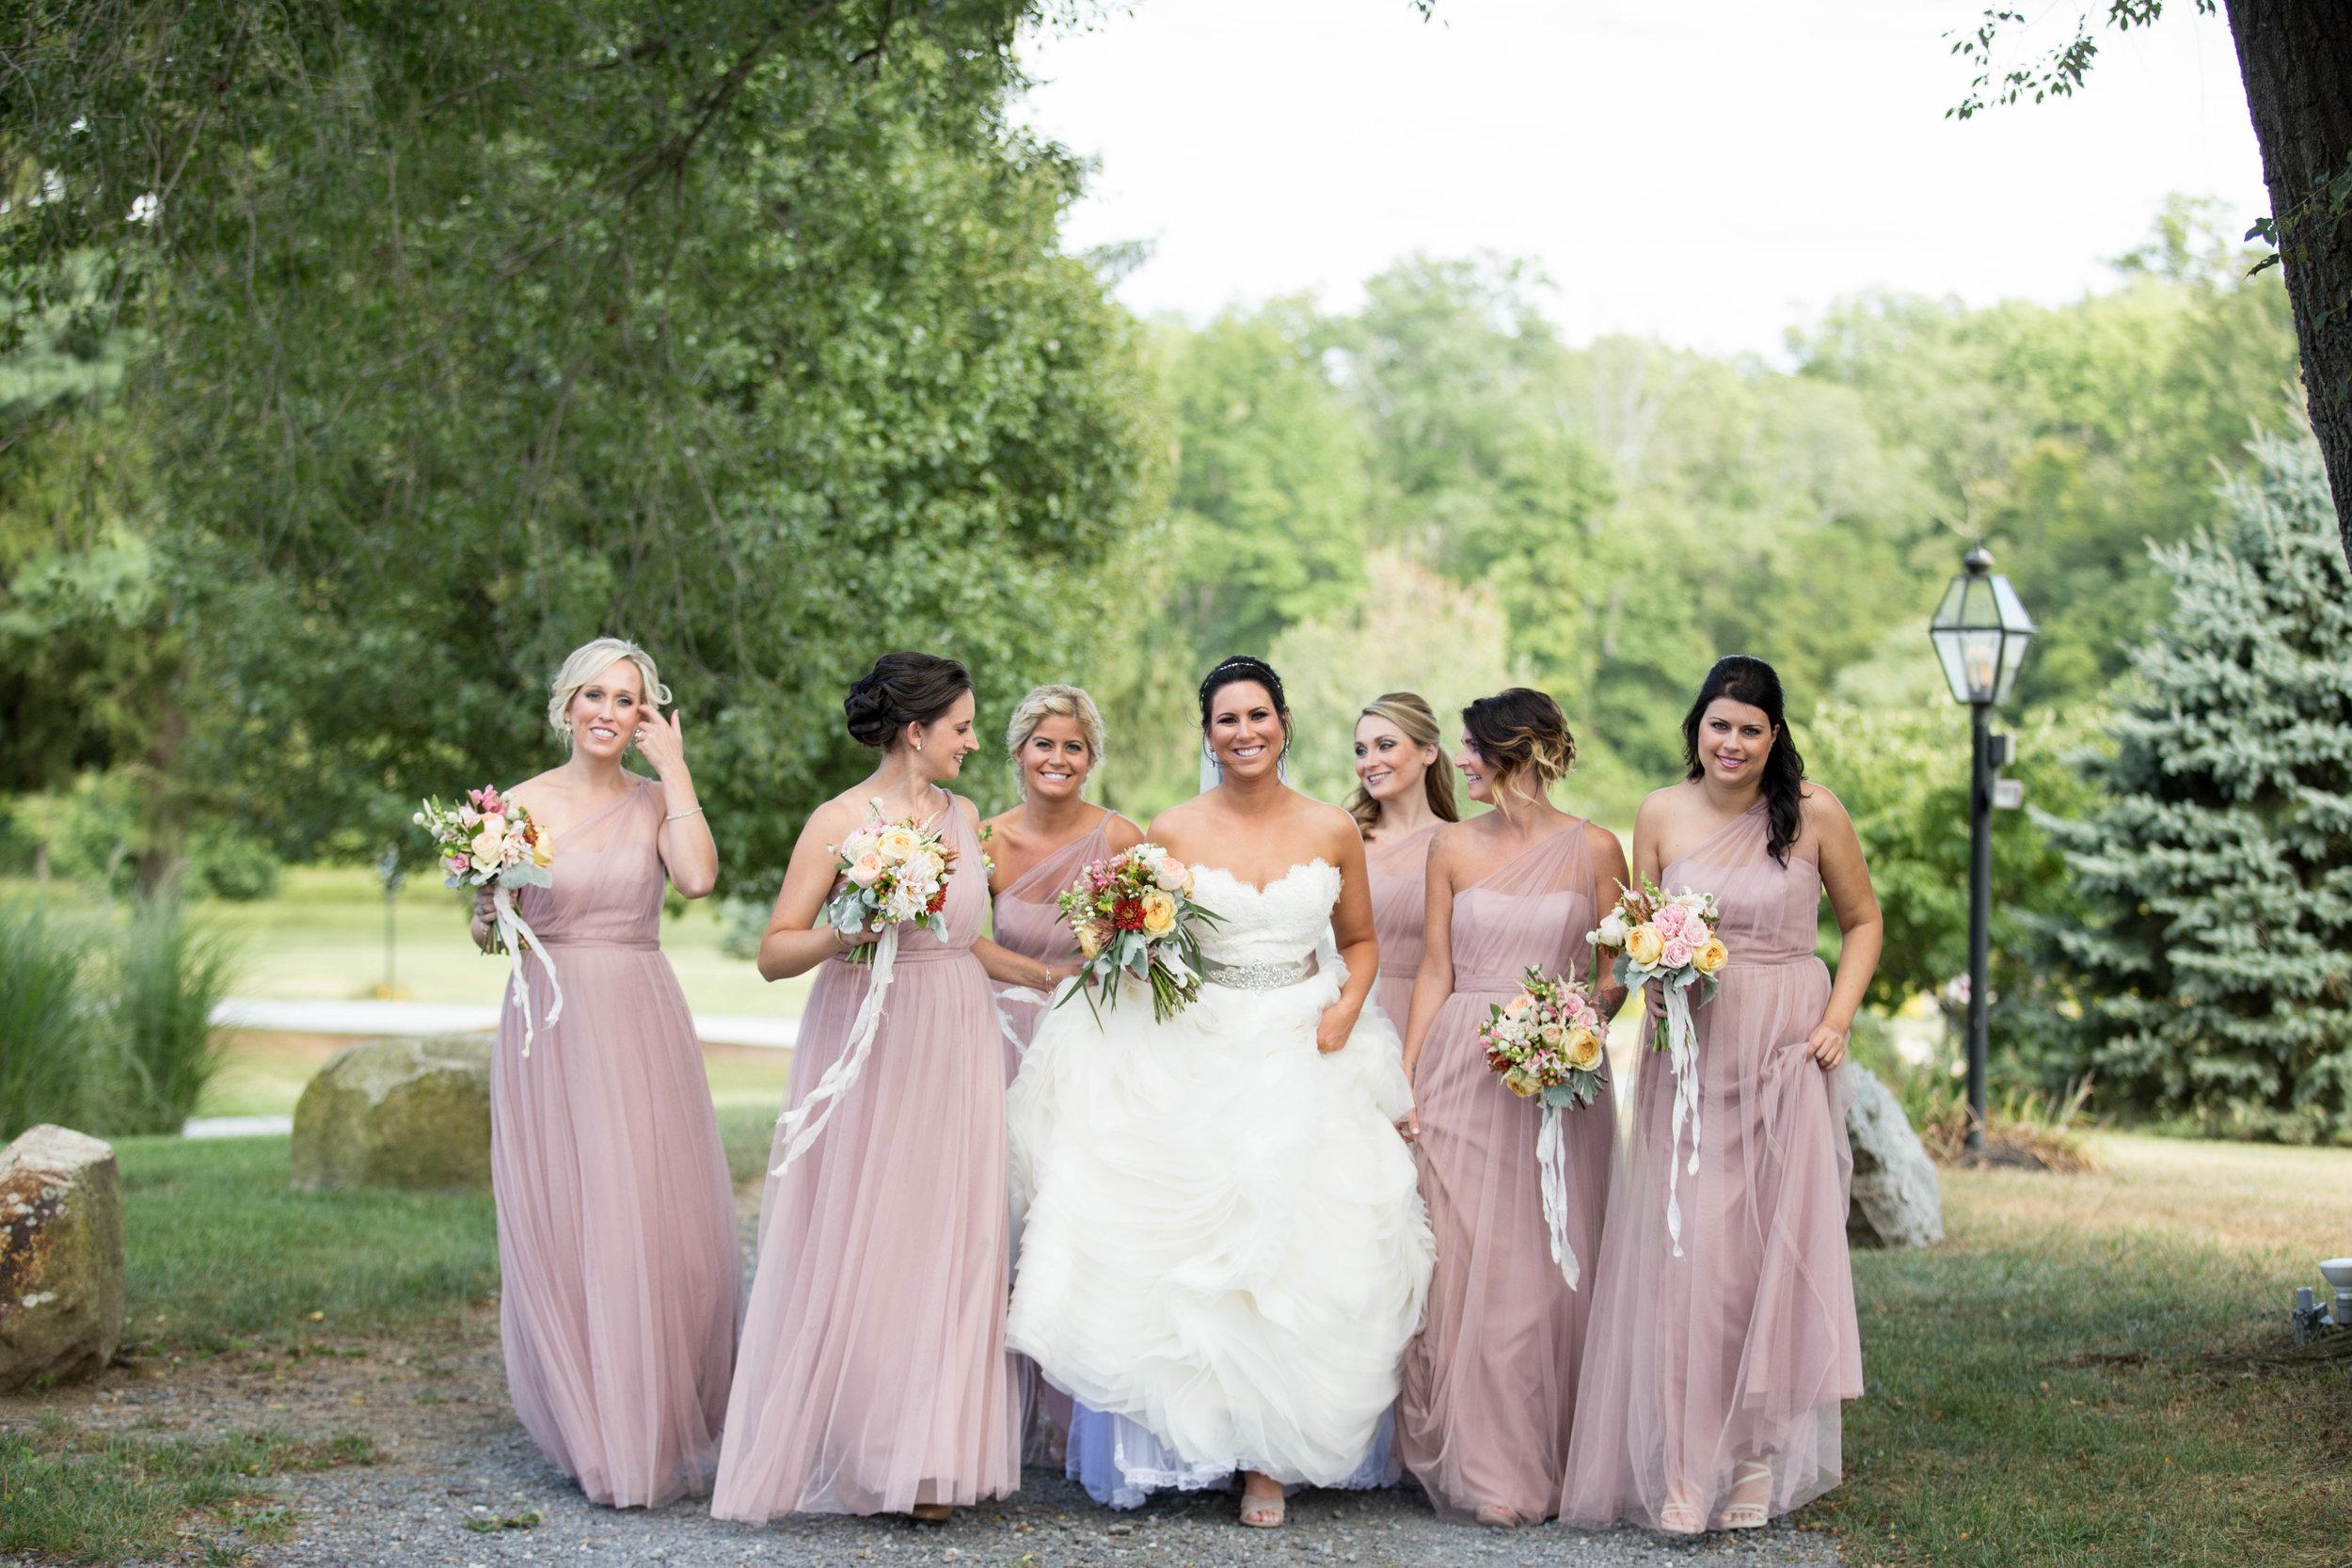 Philadelphia-Wedding-Planner-Heart-And-Dash-NicoleConnor-DrewNoelPhotography-1789.jpg